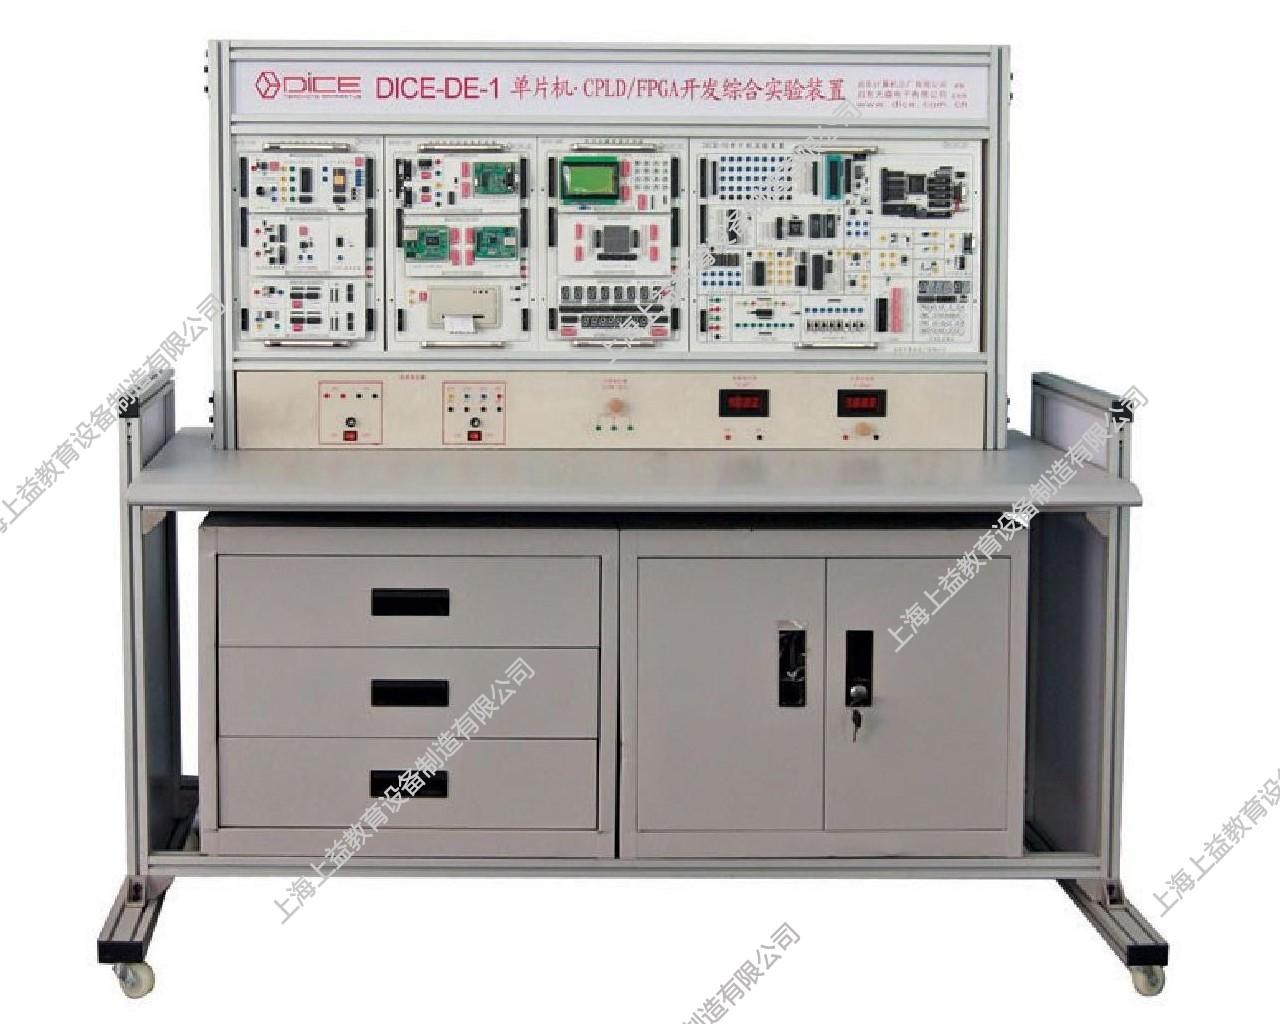 SYSKJ-16C单片机?CPLD/FPGA开发综合实验装置(微机控制开发综合wwwlehu8vip装置)